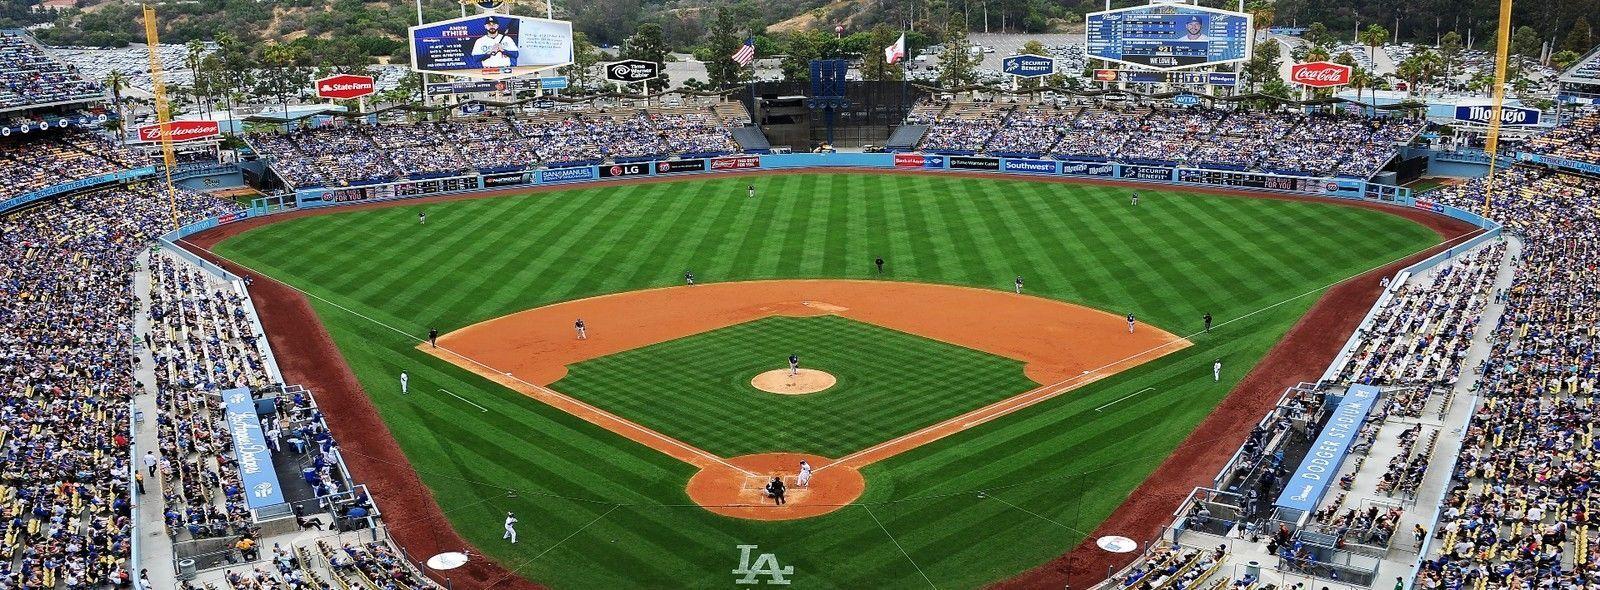 Los Angeles Dodgers Road Games